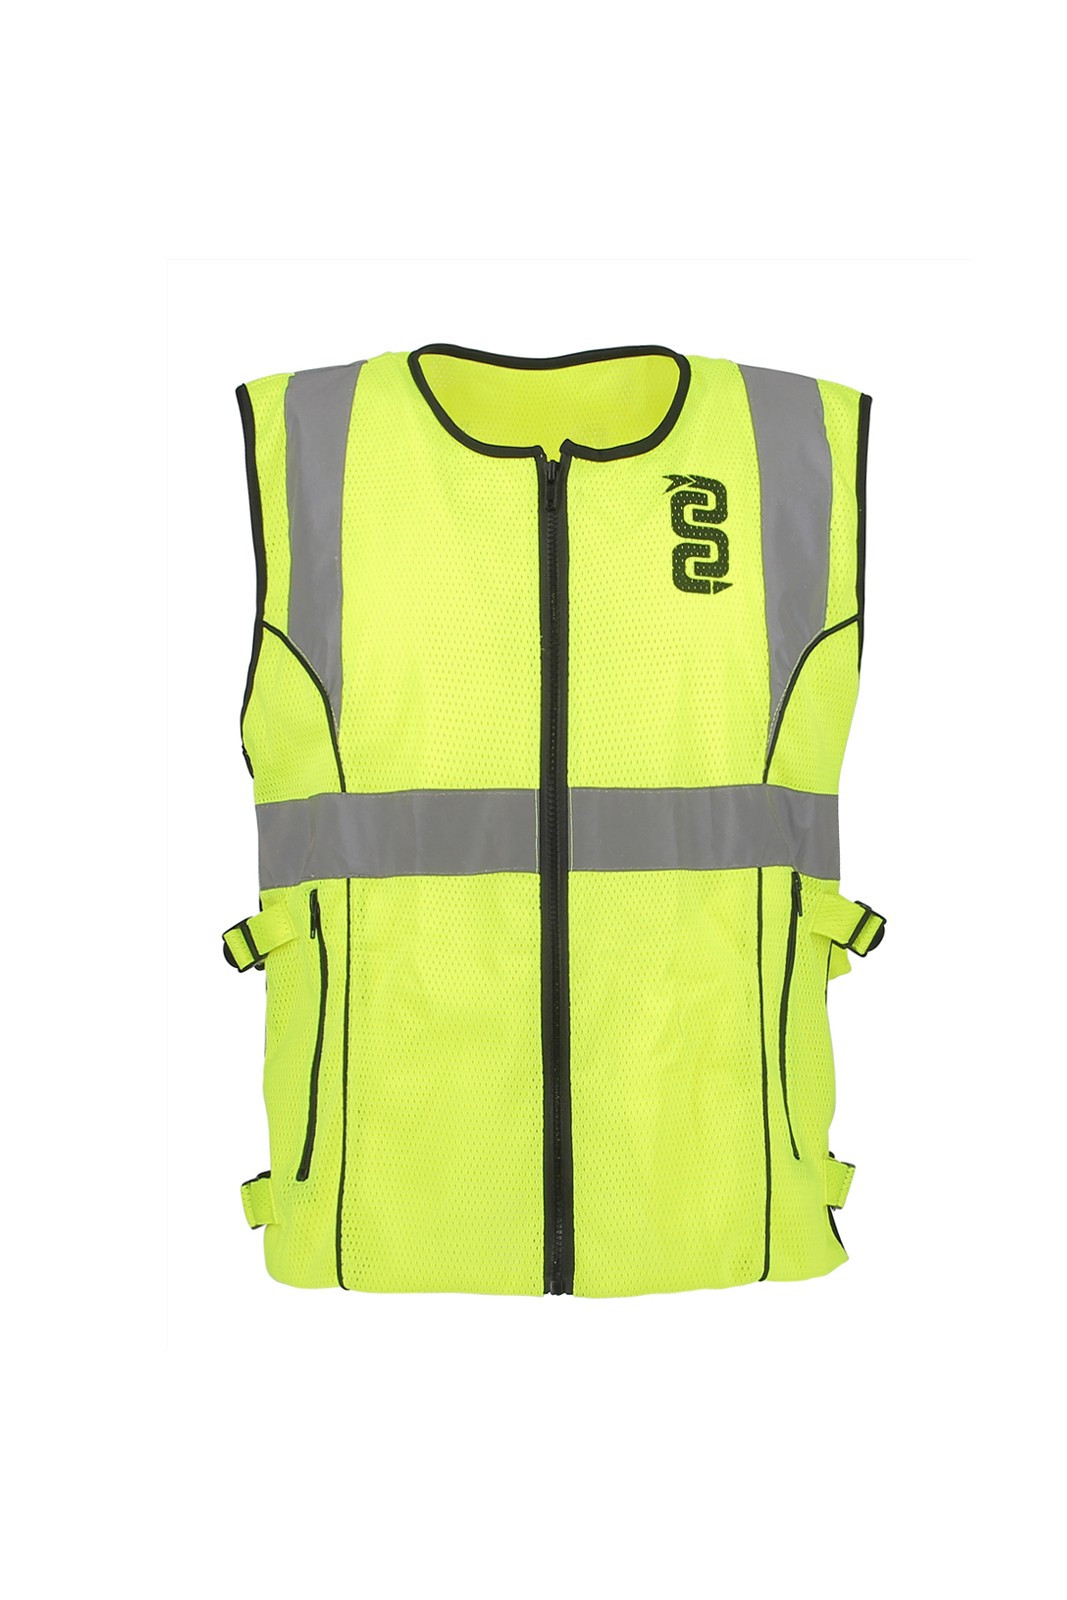 OJ Net Flash reflective vest